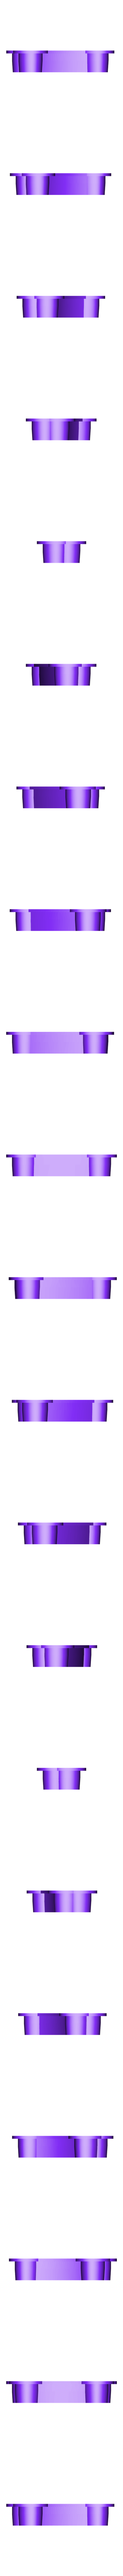 BLANC os.STL Download STL file Patrol Punch (Paw Patrol) • 3D print object, Chris-tropherIlParait